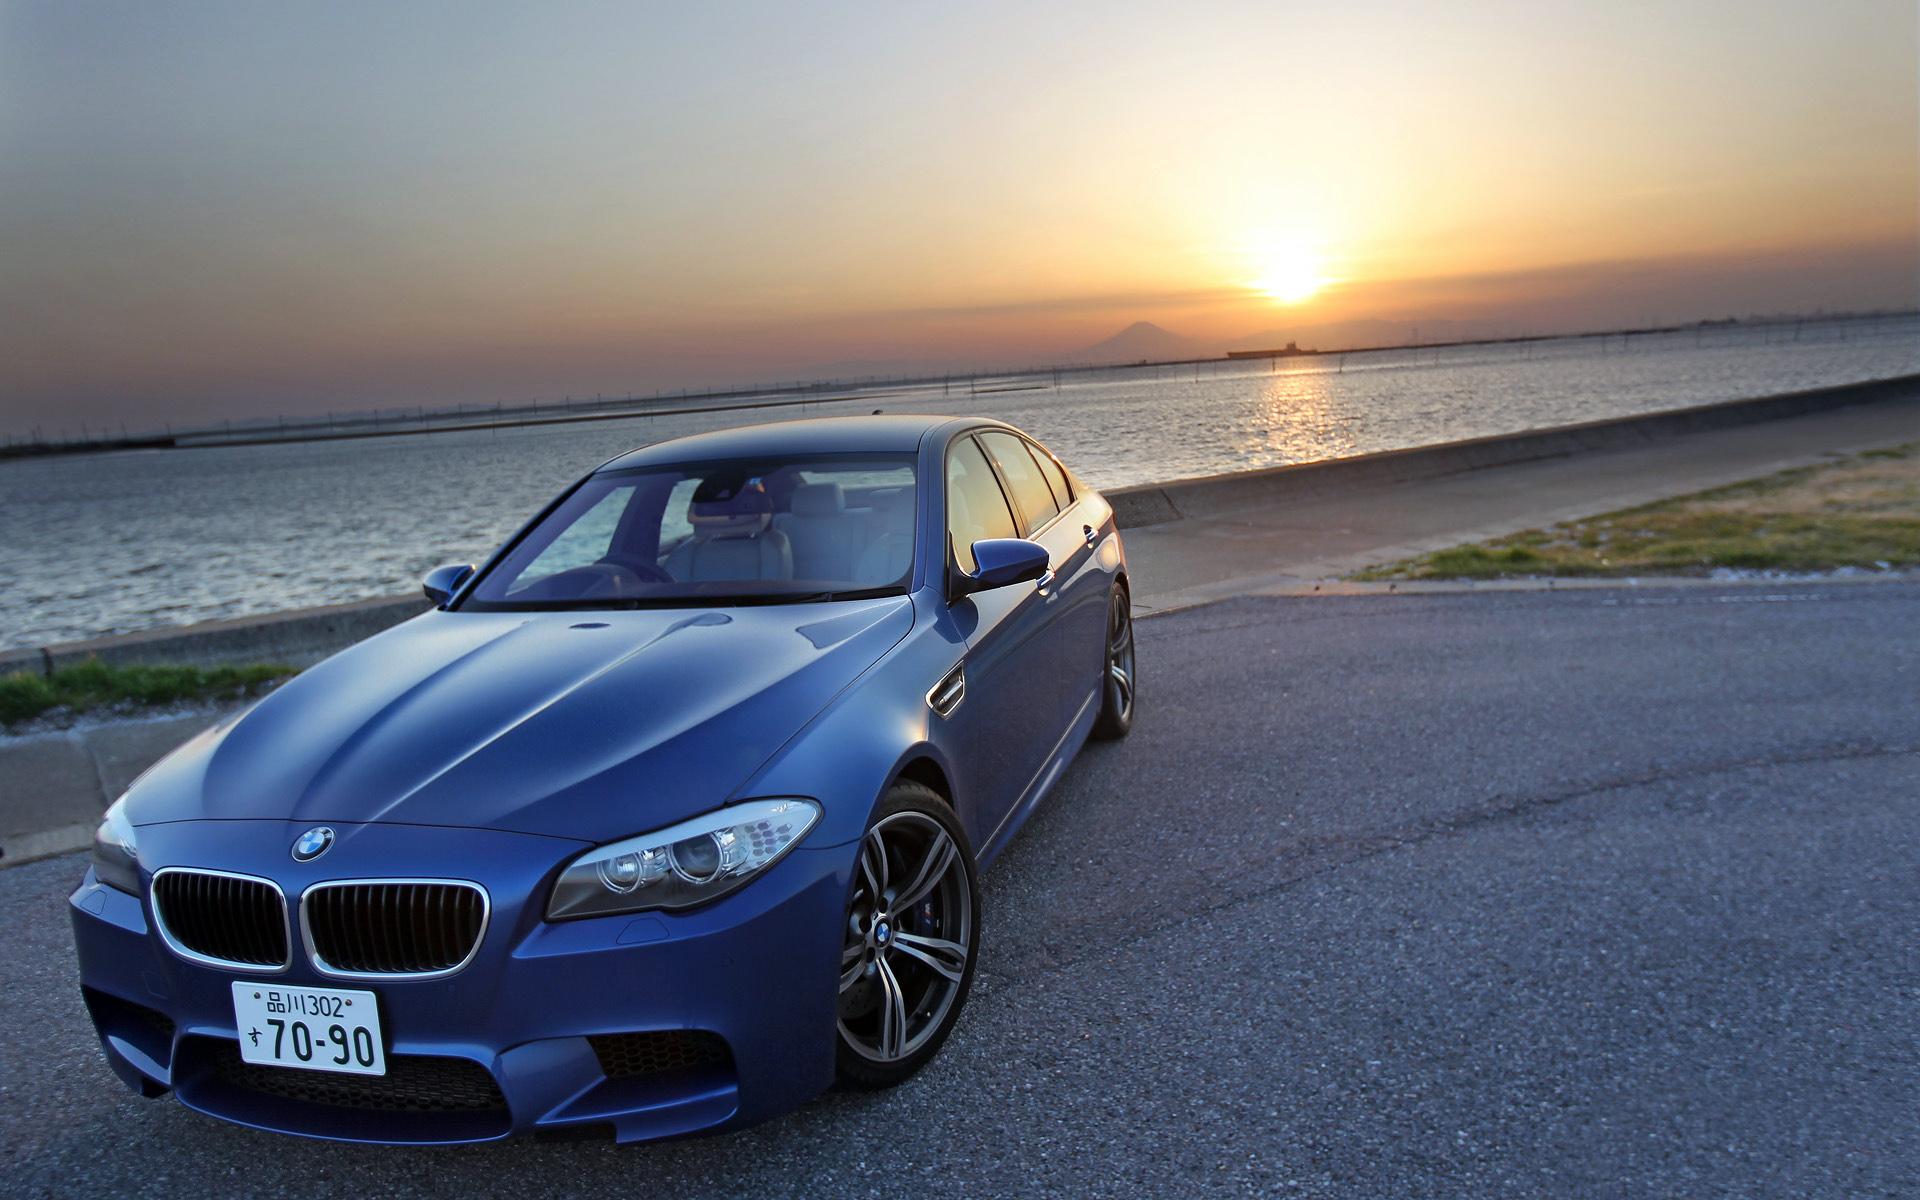 THE BMW M5 Wallpaper HD Car Wallpapers ID 2672 1920x1200